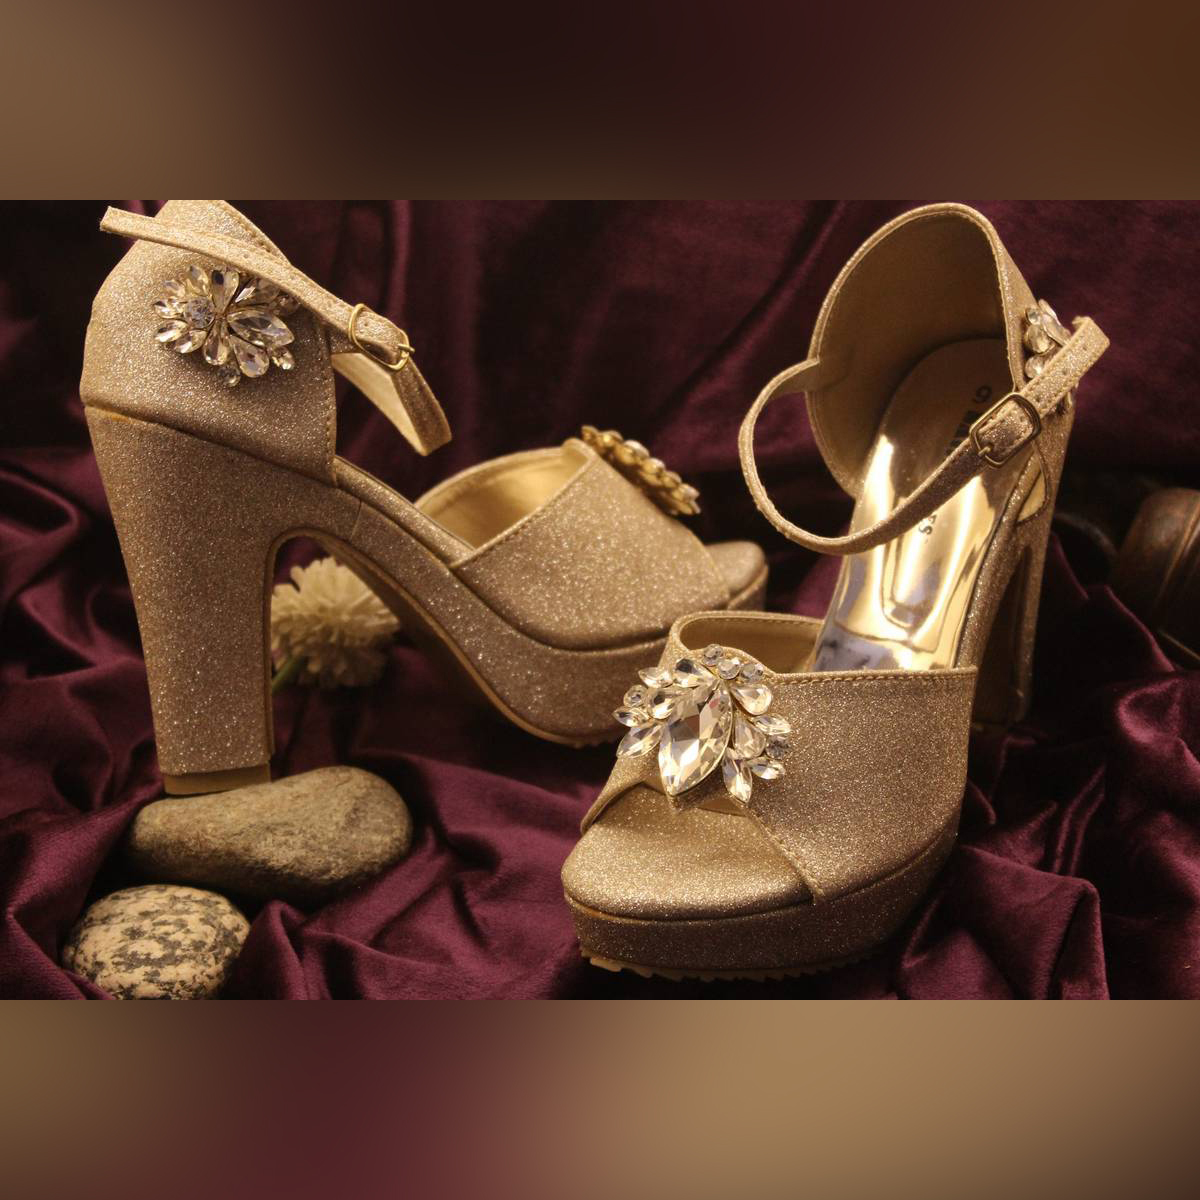 high heels sandals for women  - 723